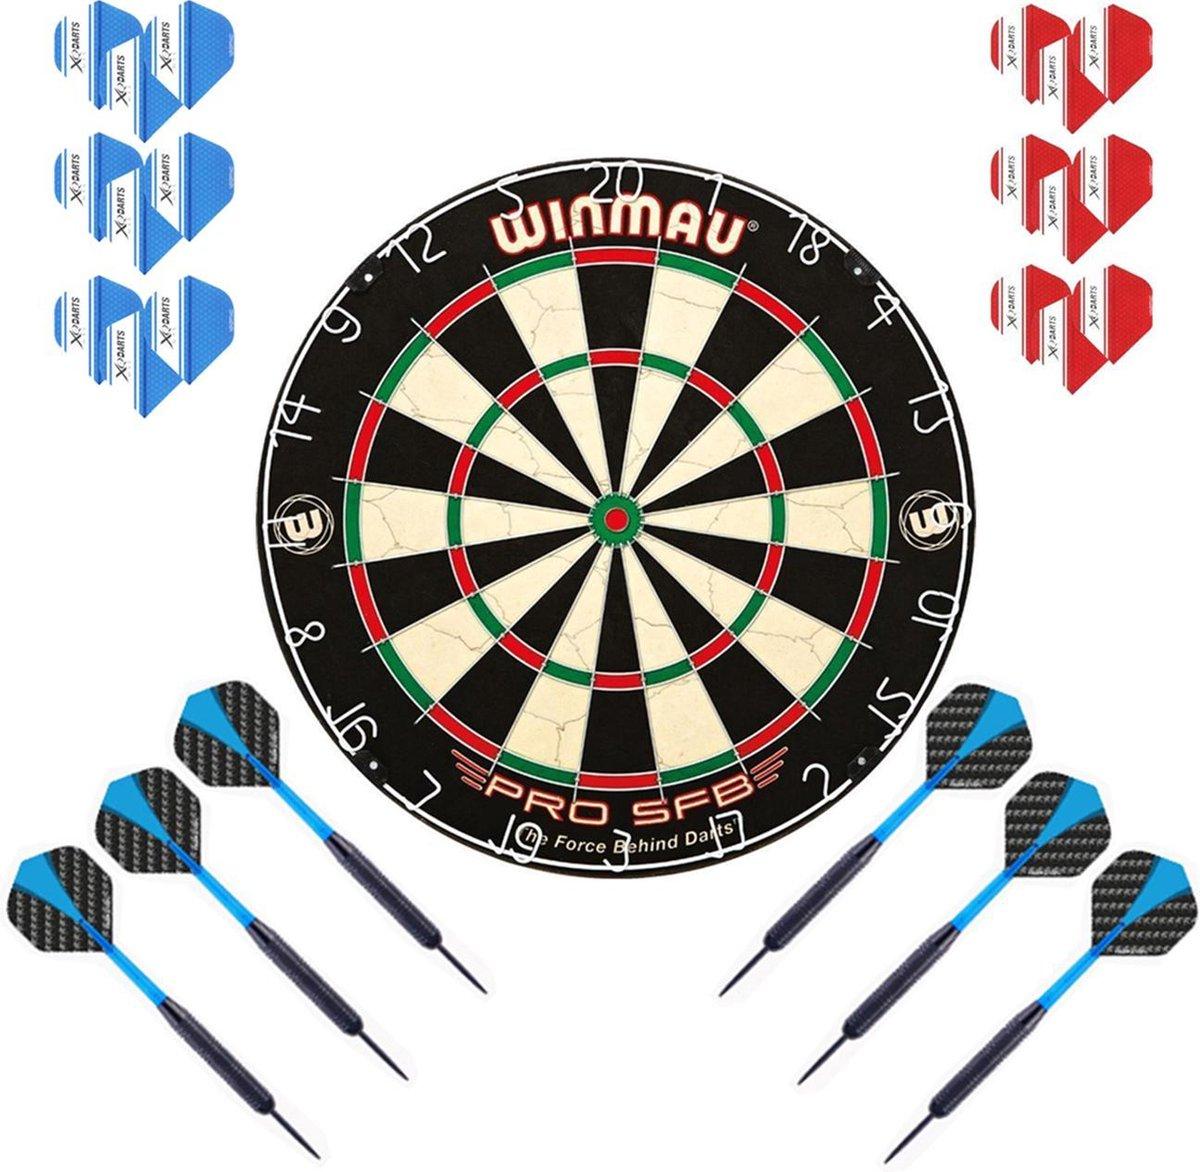 Dragon Darts Winmau PRO SFB set - dartbord - 2 sets - dartpijlen - dart shafts - dart flights - Winmau PRO SFB